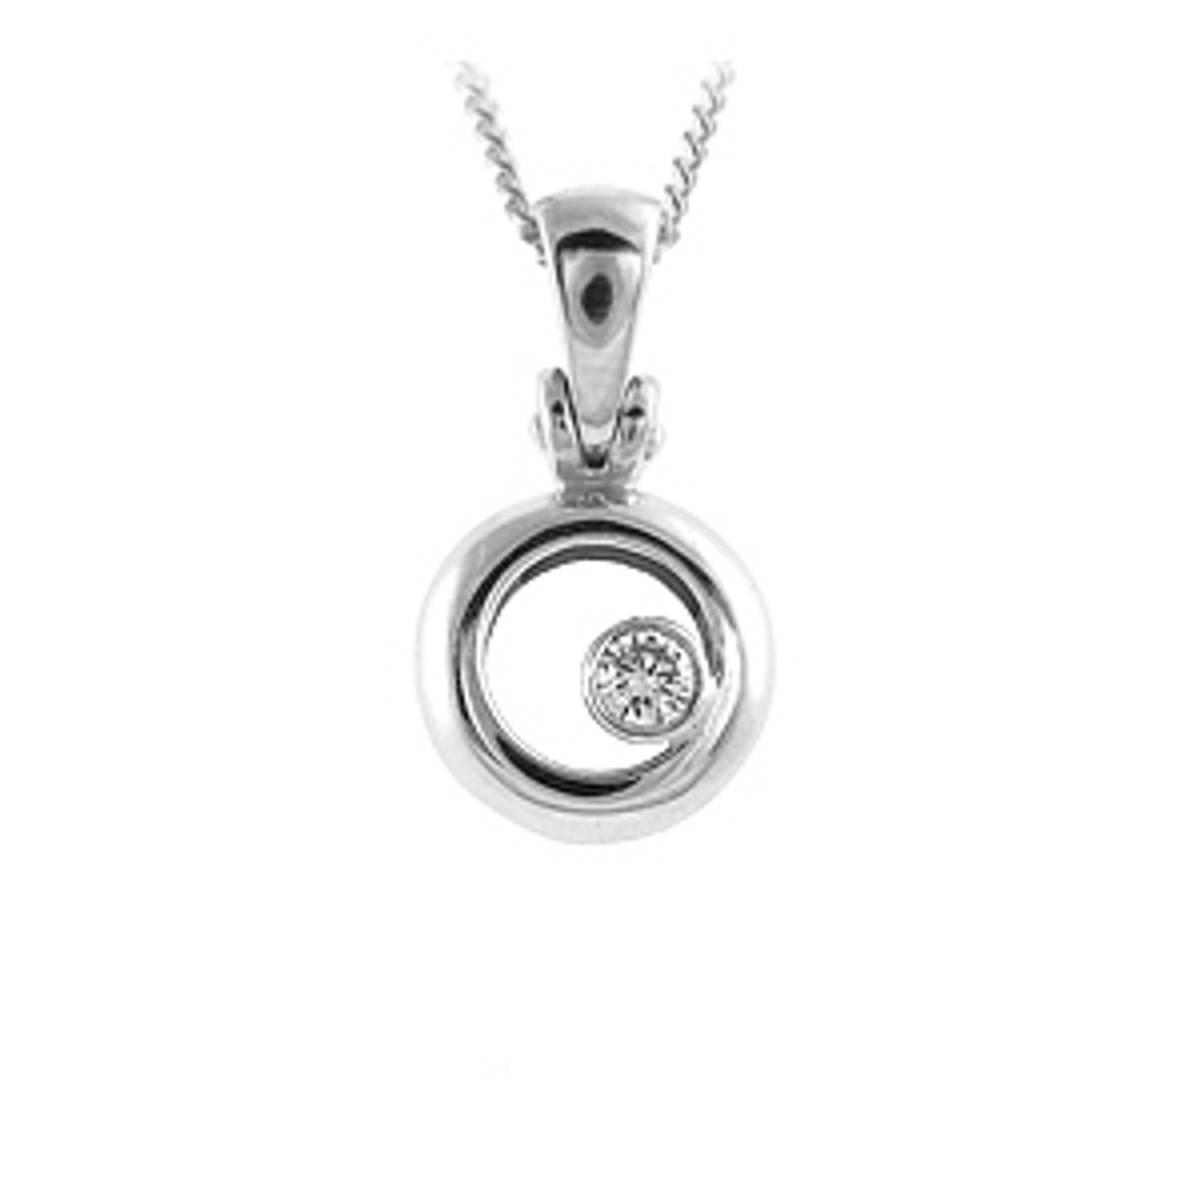 DP3439Diamond rubover set circle pendantPictured item: 0.12ct brilliant cut diamond set in 18k white goldAvailable in: 18k gold